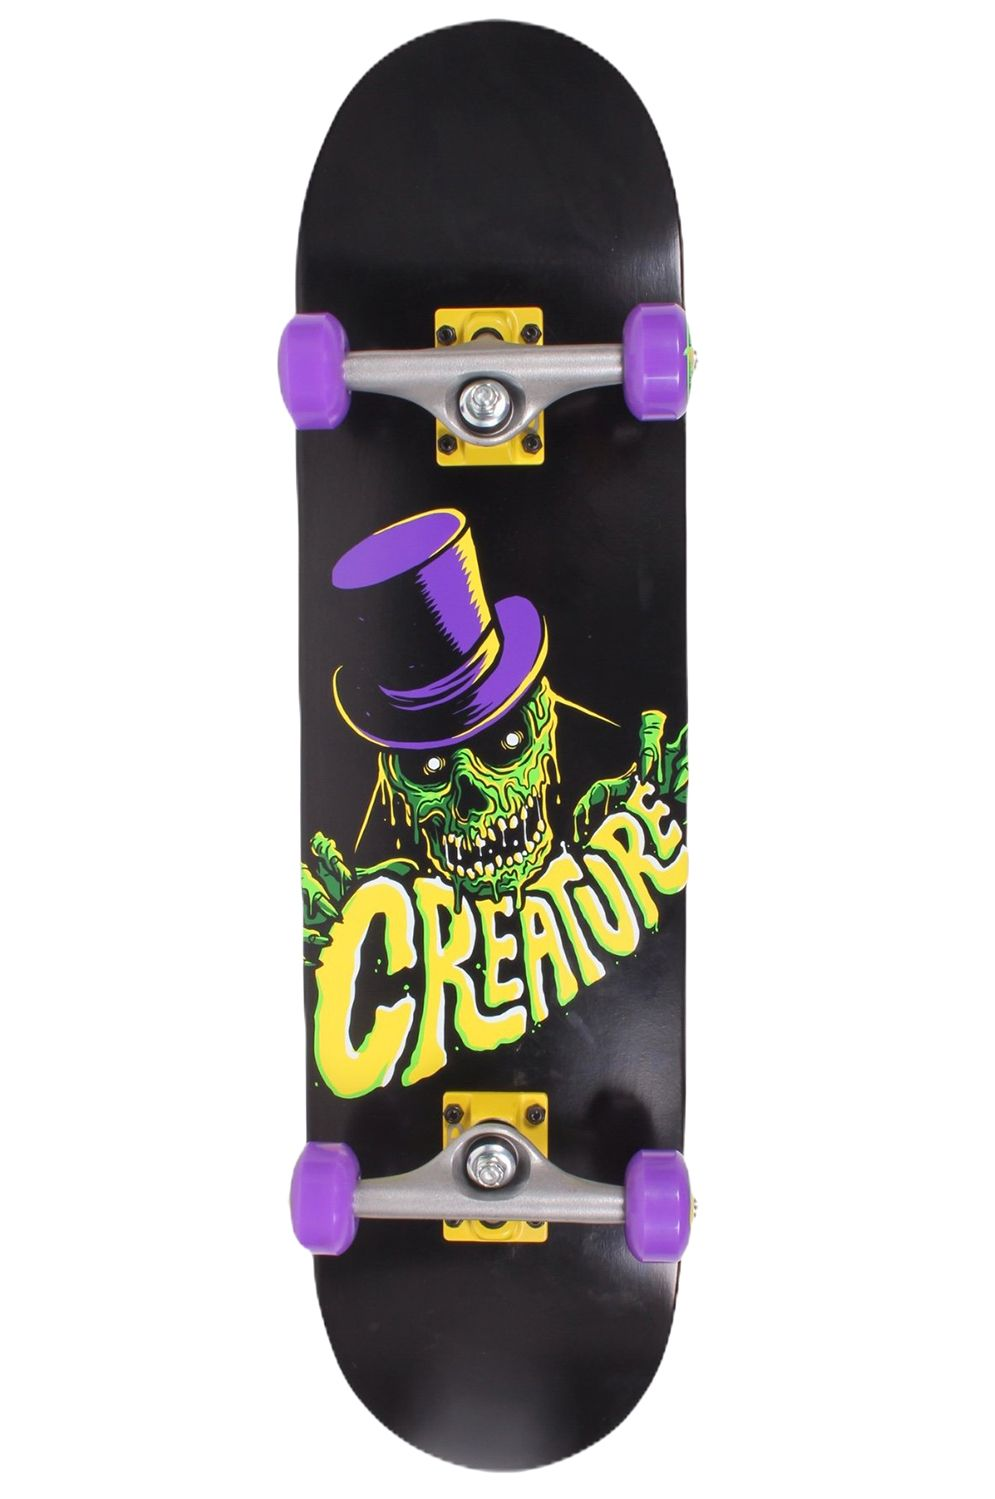 Street Skate Creature CRYPT KEEPER MINI SK8 COMPLETES 7.75